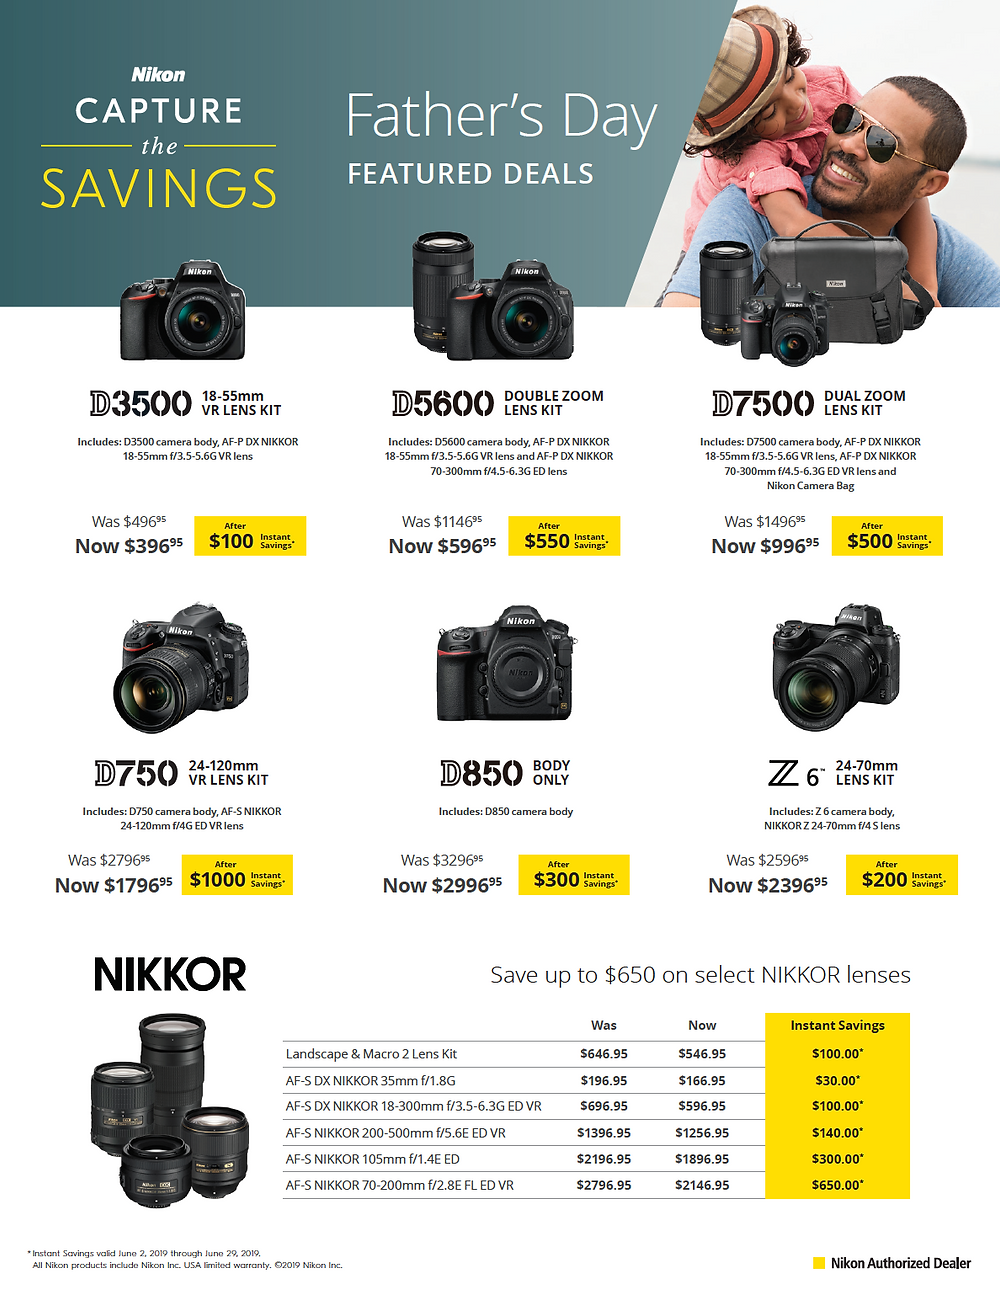 Nikon Capture the Savings for camera and lens kits